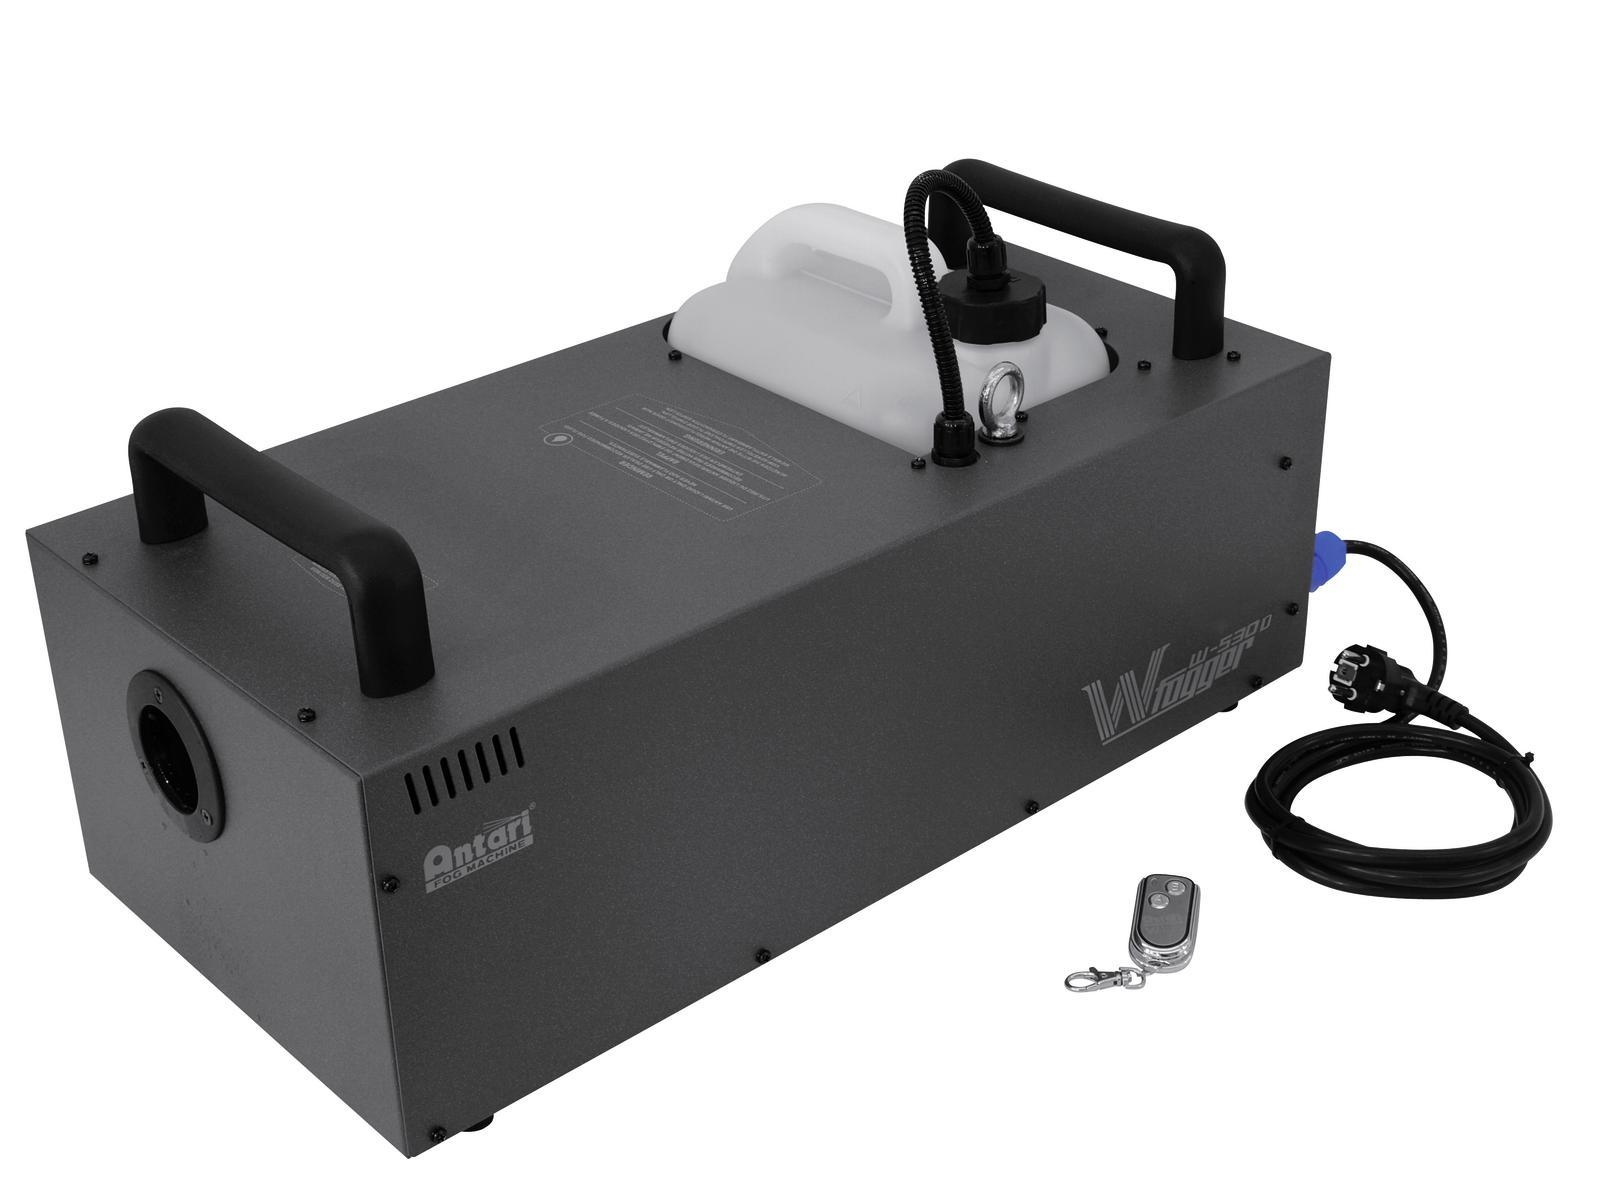 Fotografie Antari W-530D Pro výrobník mlhy 3000W